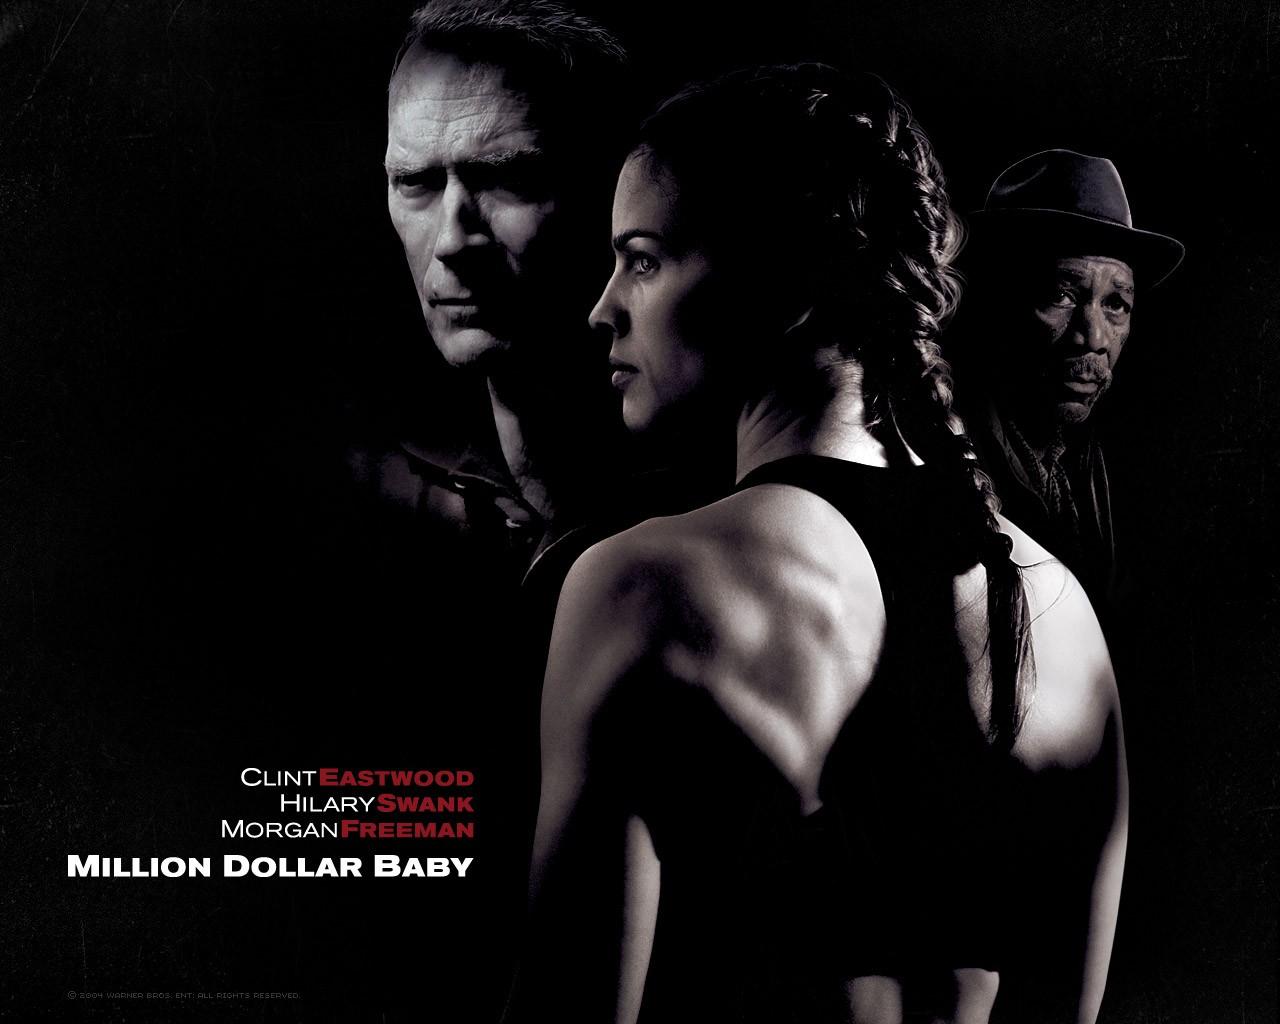 Un wallpaper del film 'Million Dollar Baby'